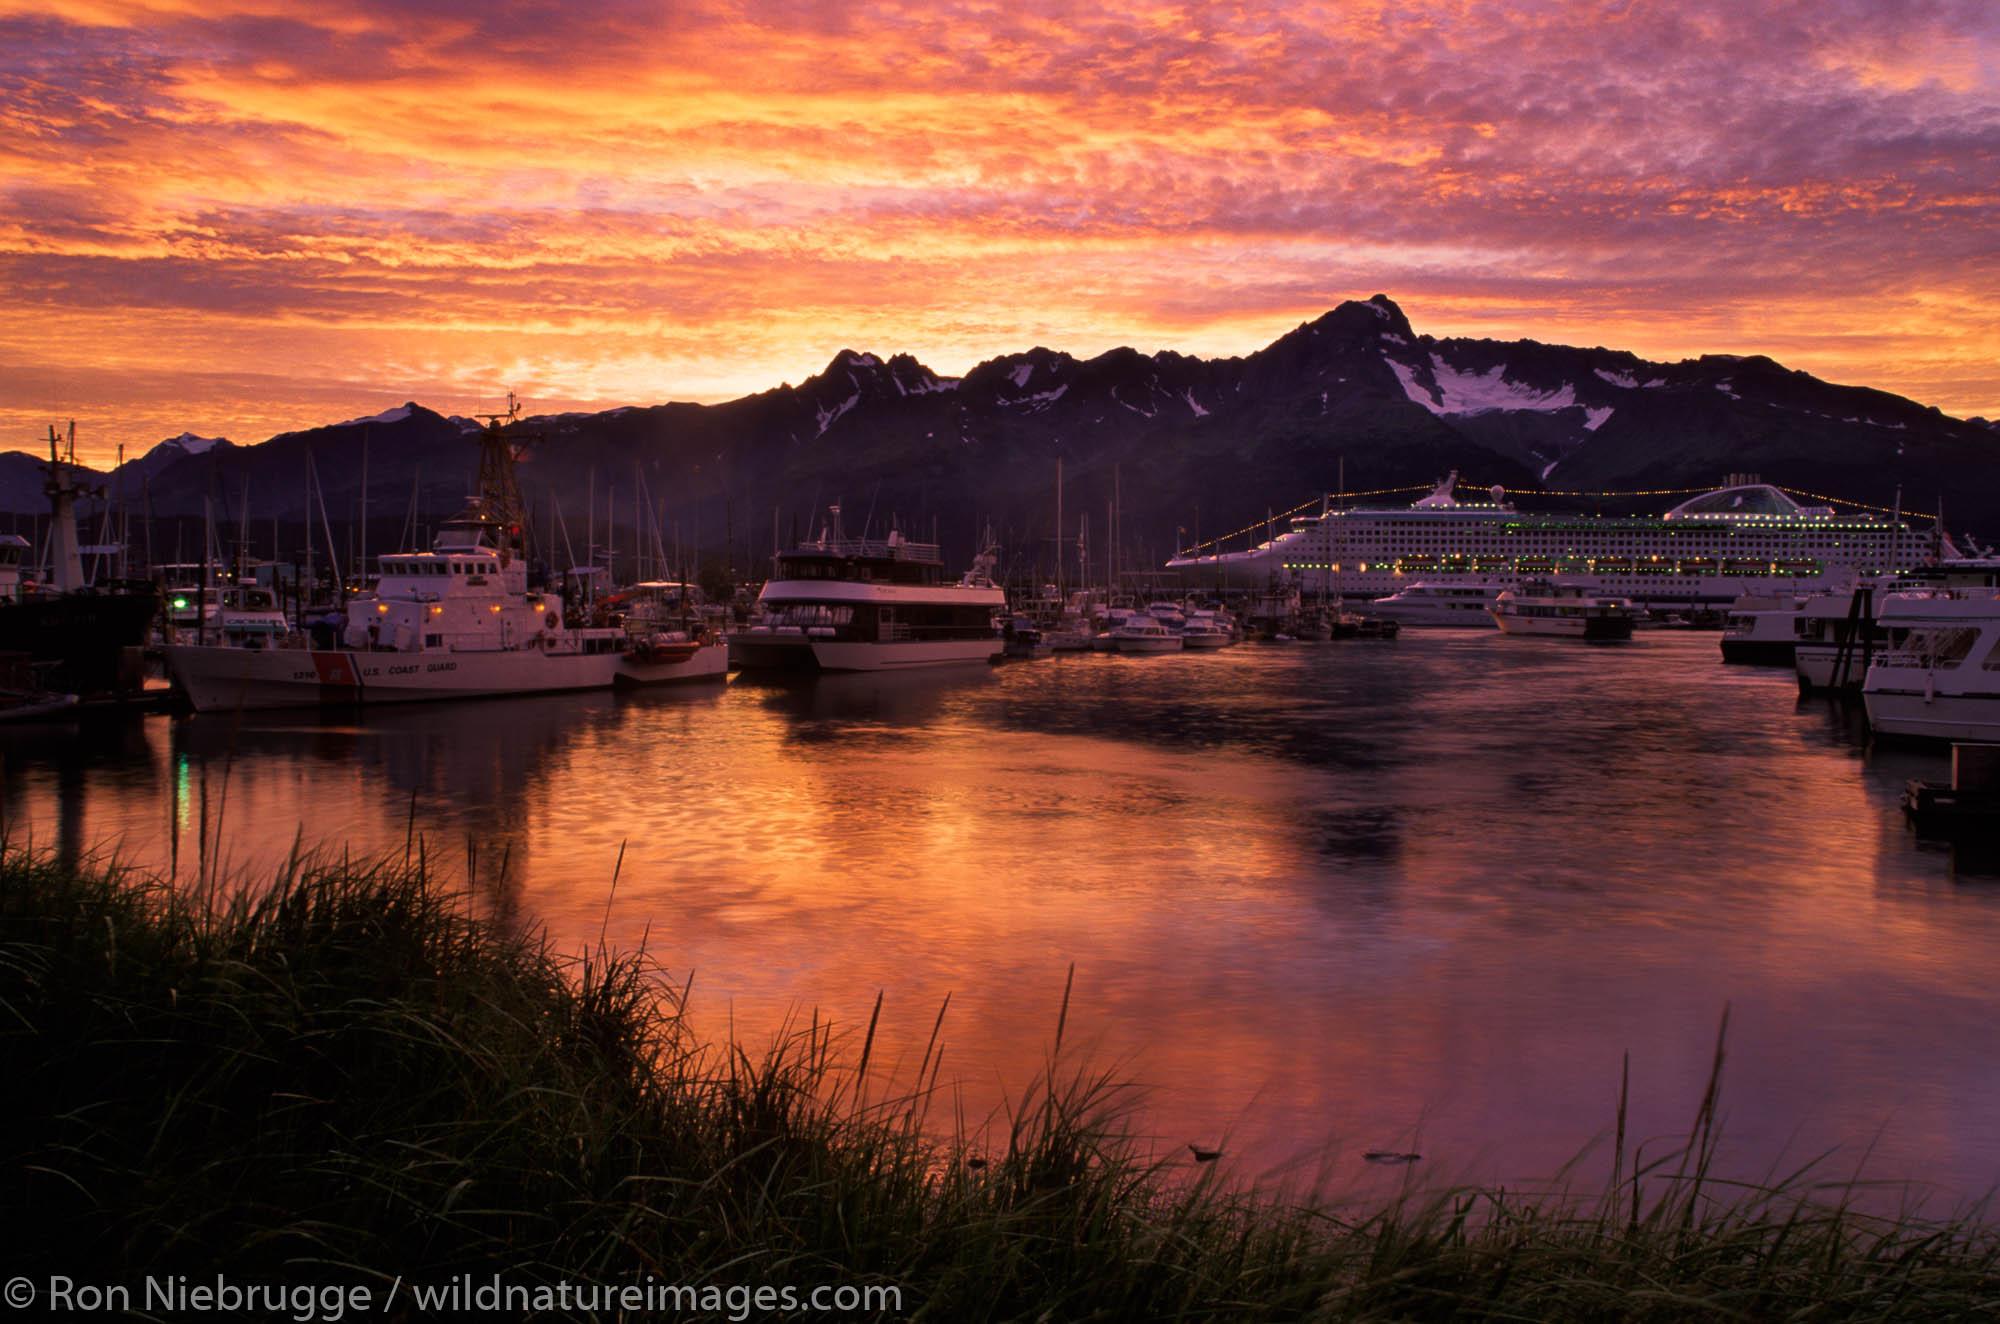 Sunrise over Boat Harbor, Seward, Alaska